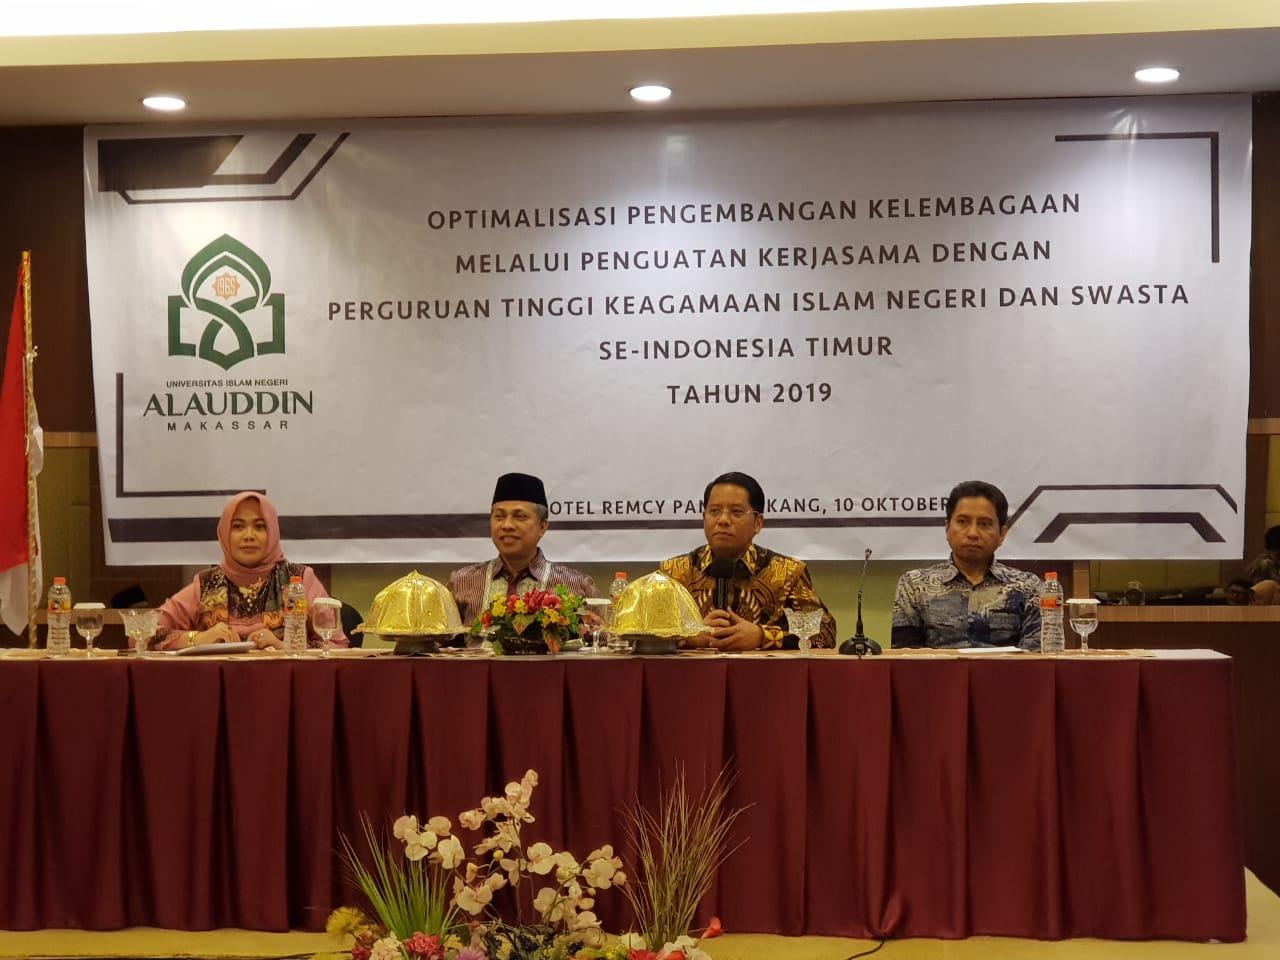 Gambar Kedua Kalinya, UIN Alauddin Gelar Persemakmuran Kerjasama Indonesia Bagian Timur